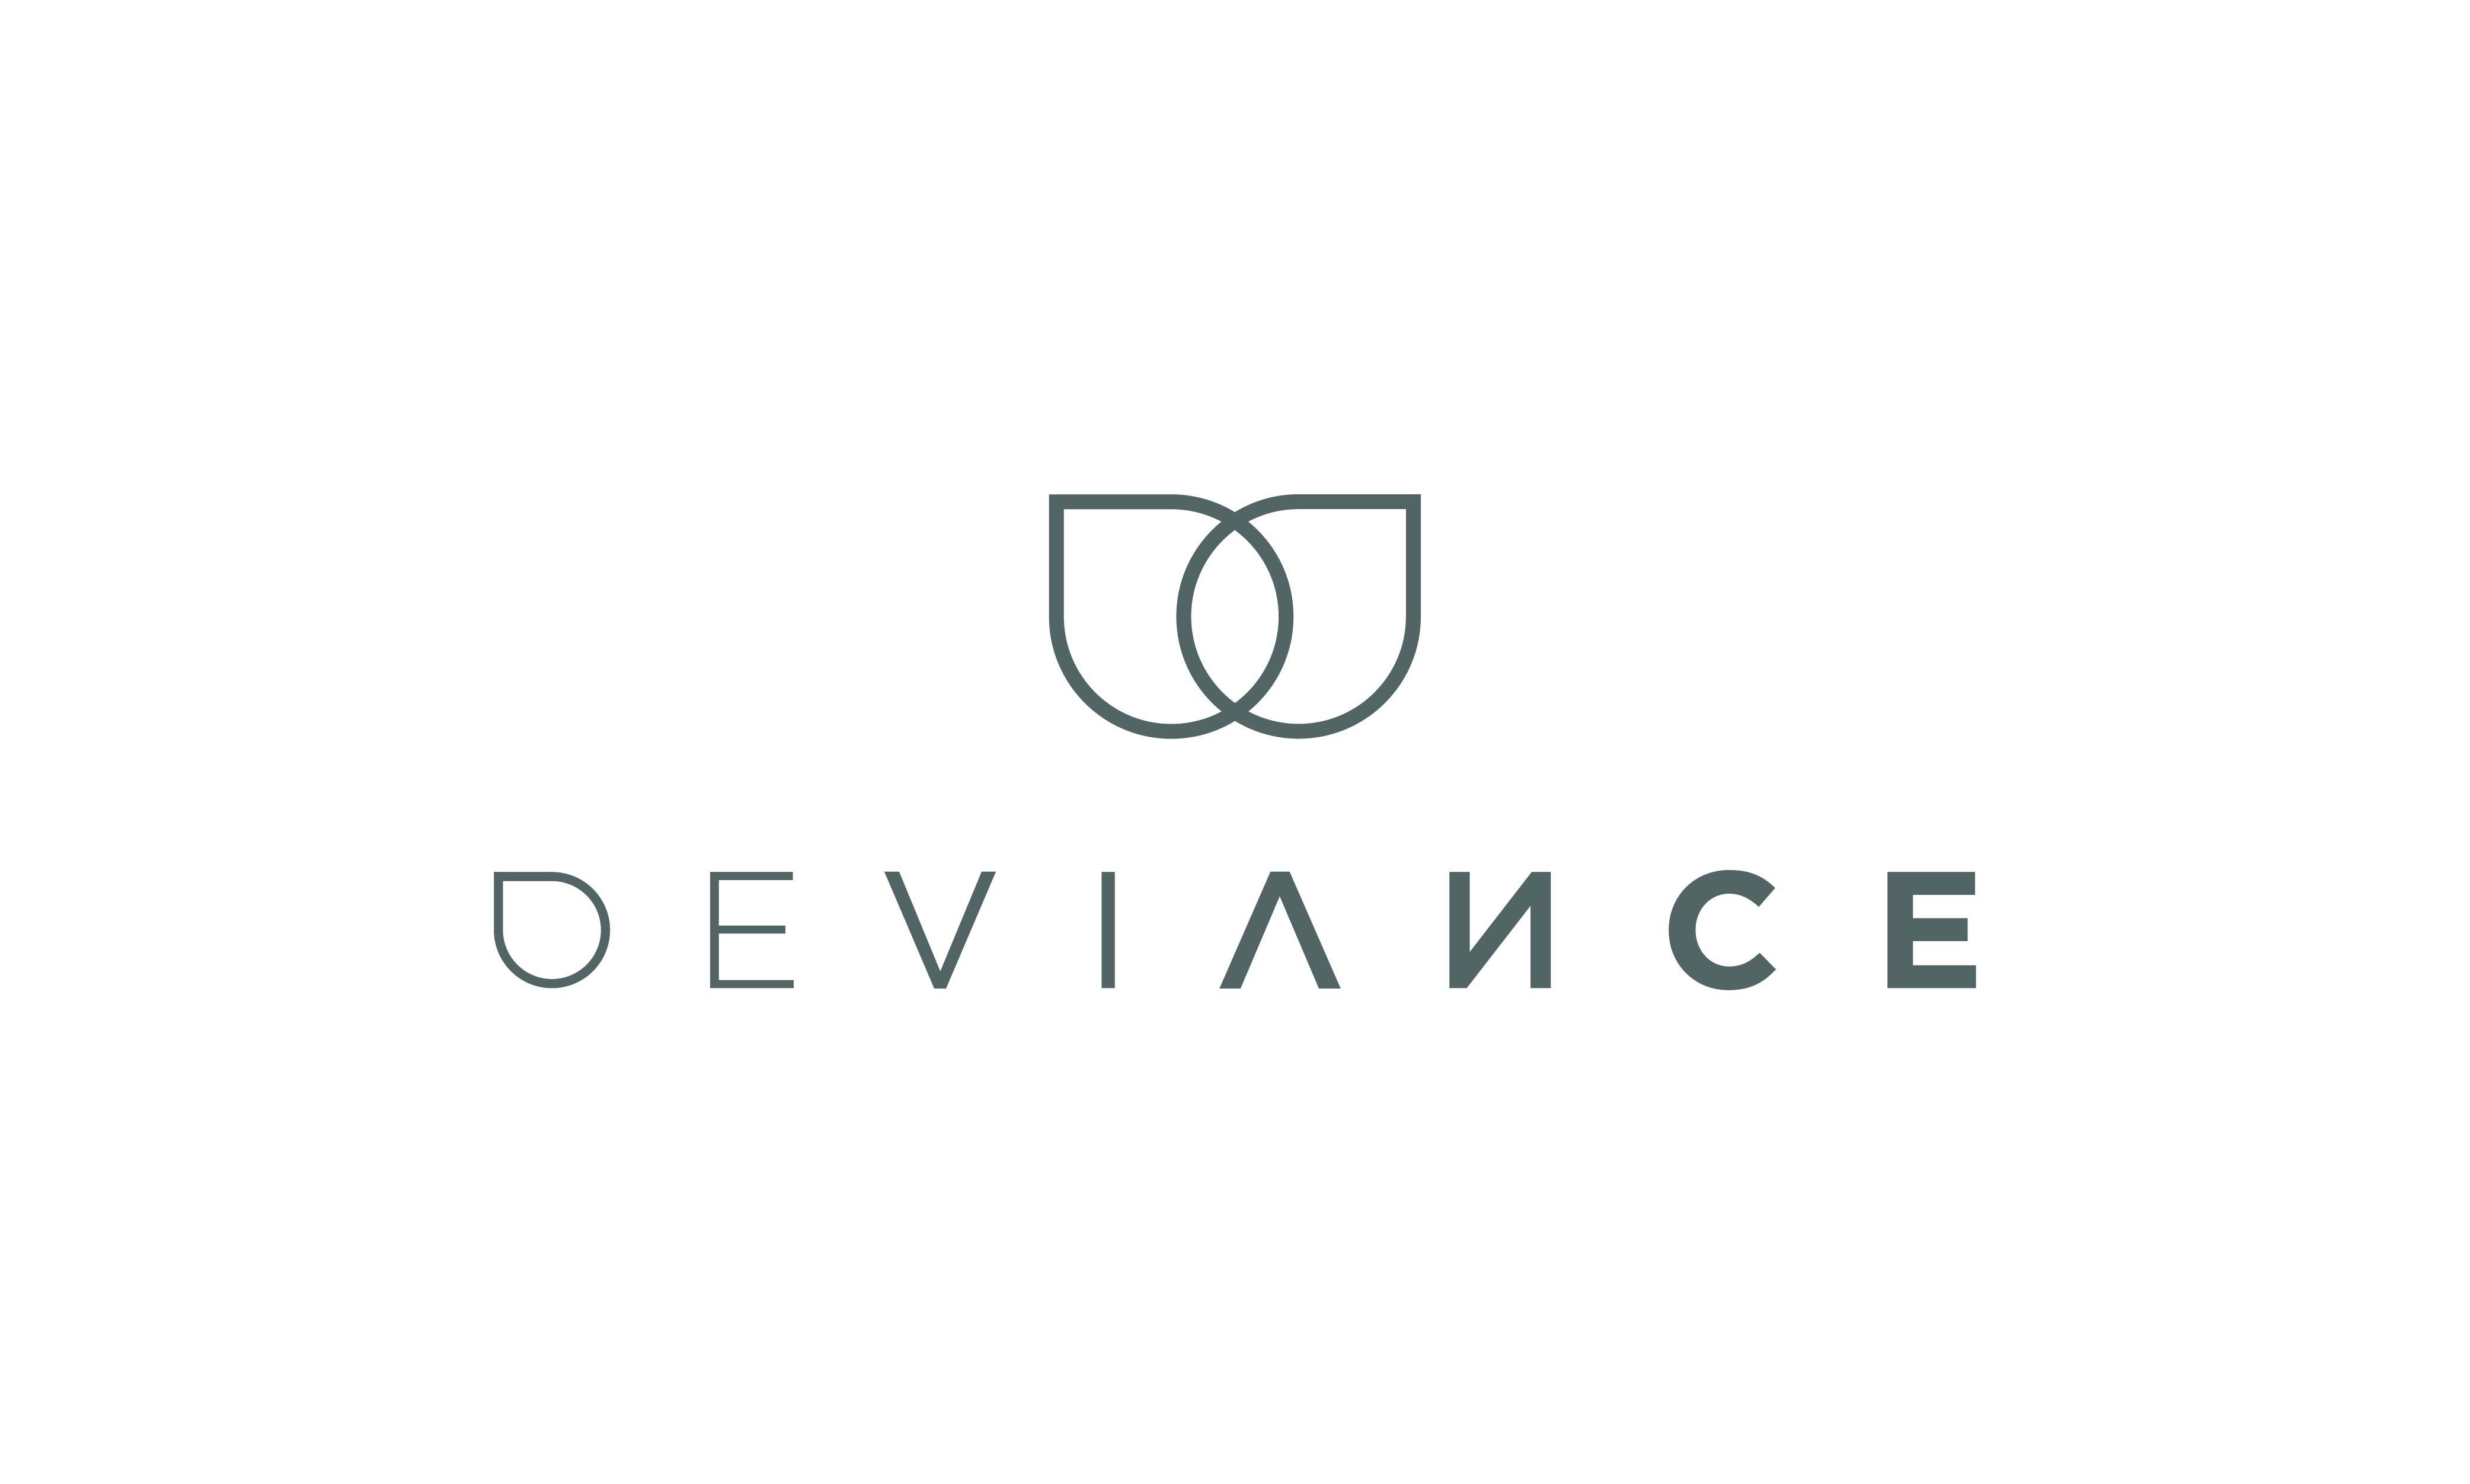 Upcoming Beauty brand needs a big brand logo